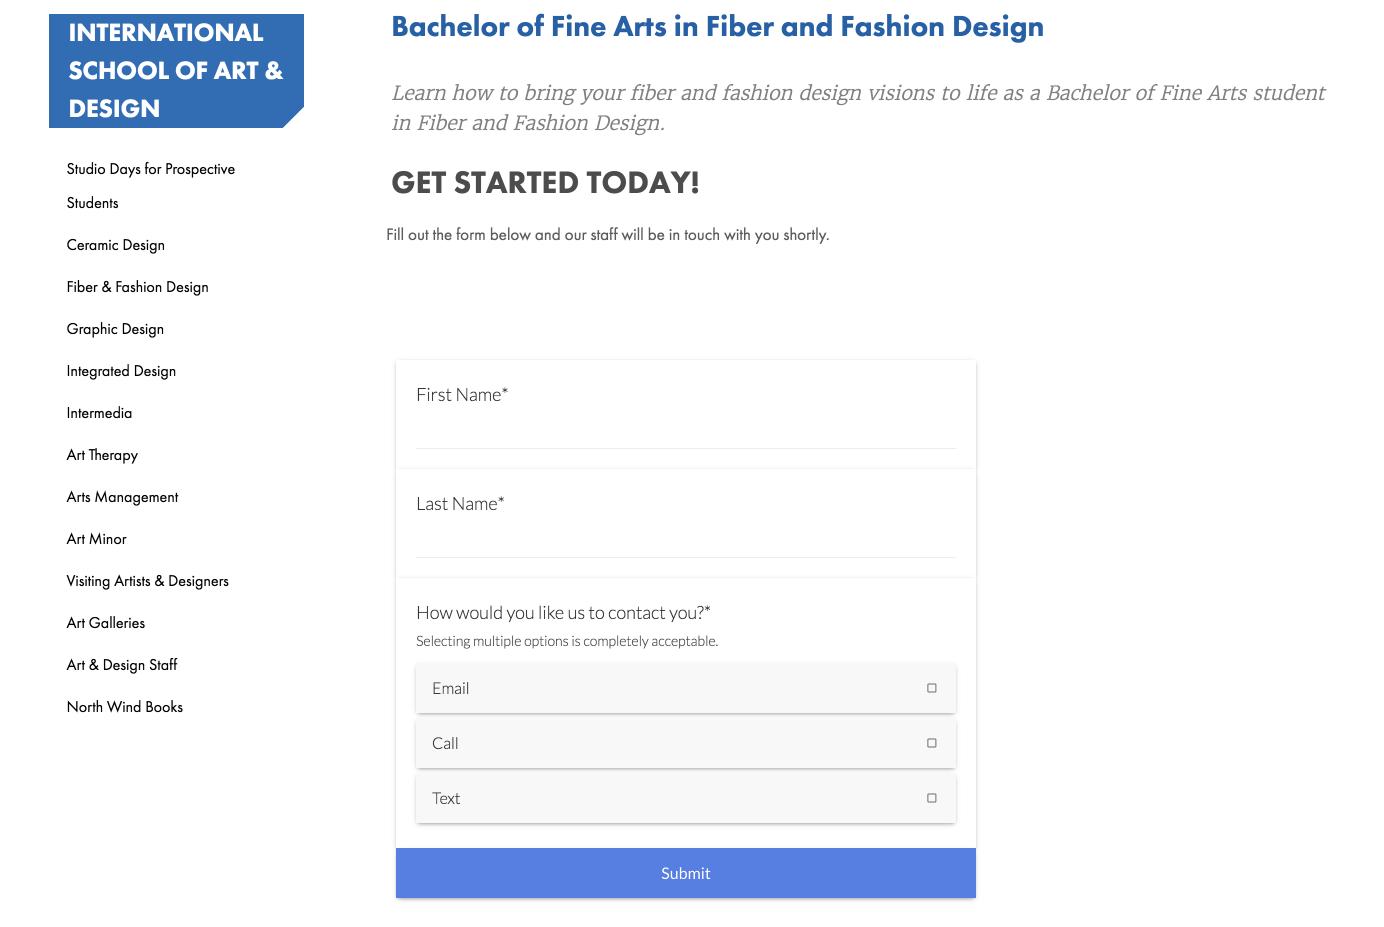 Finlandia University's RFI form